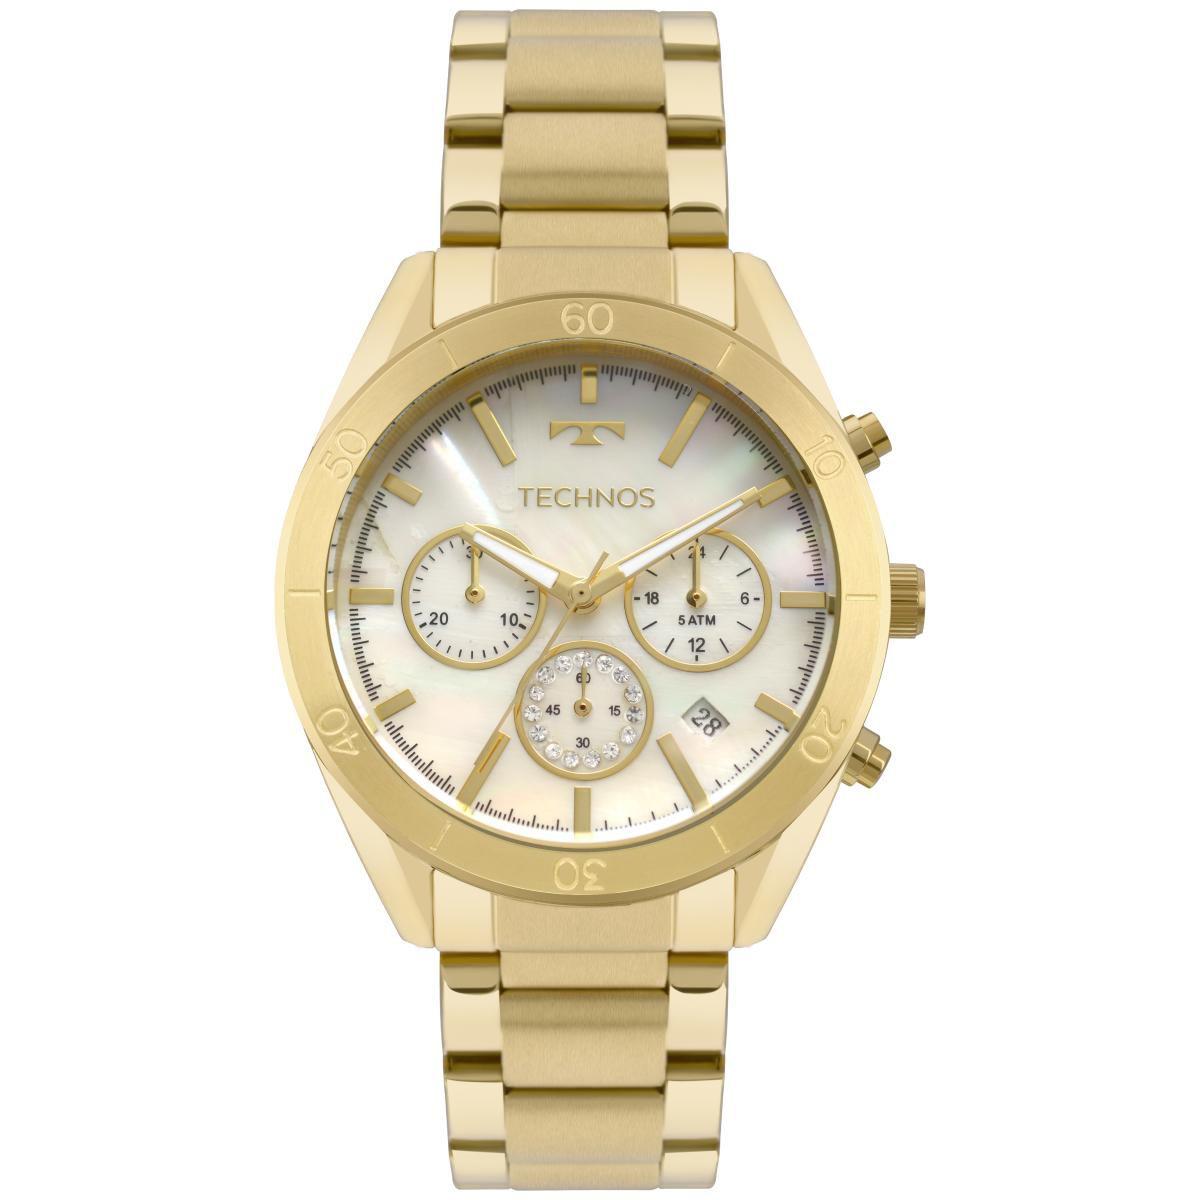 Relógio Feminino Technos Elegance Ladies JS25BV/4B 40mm Aço Dourado